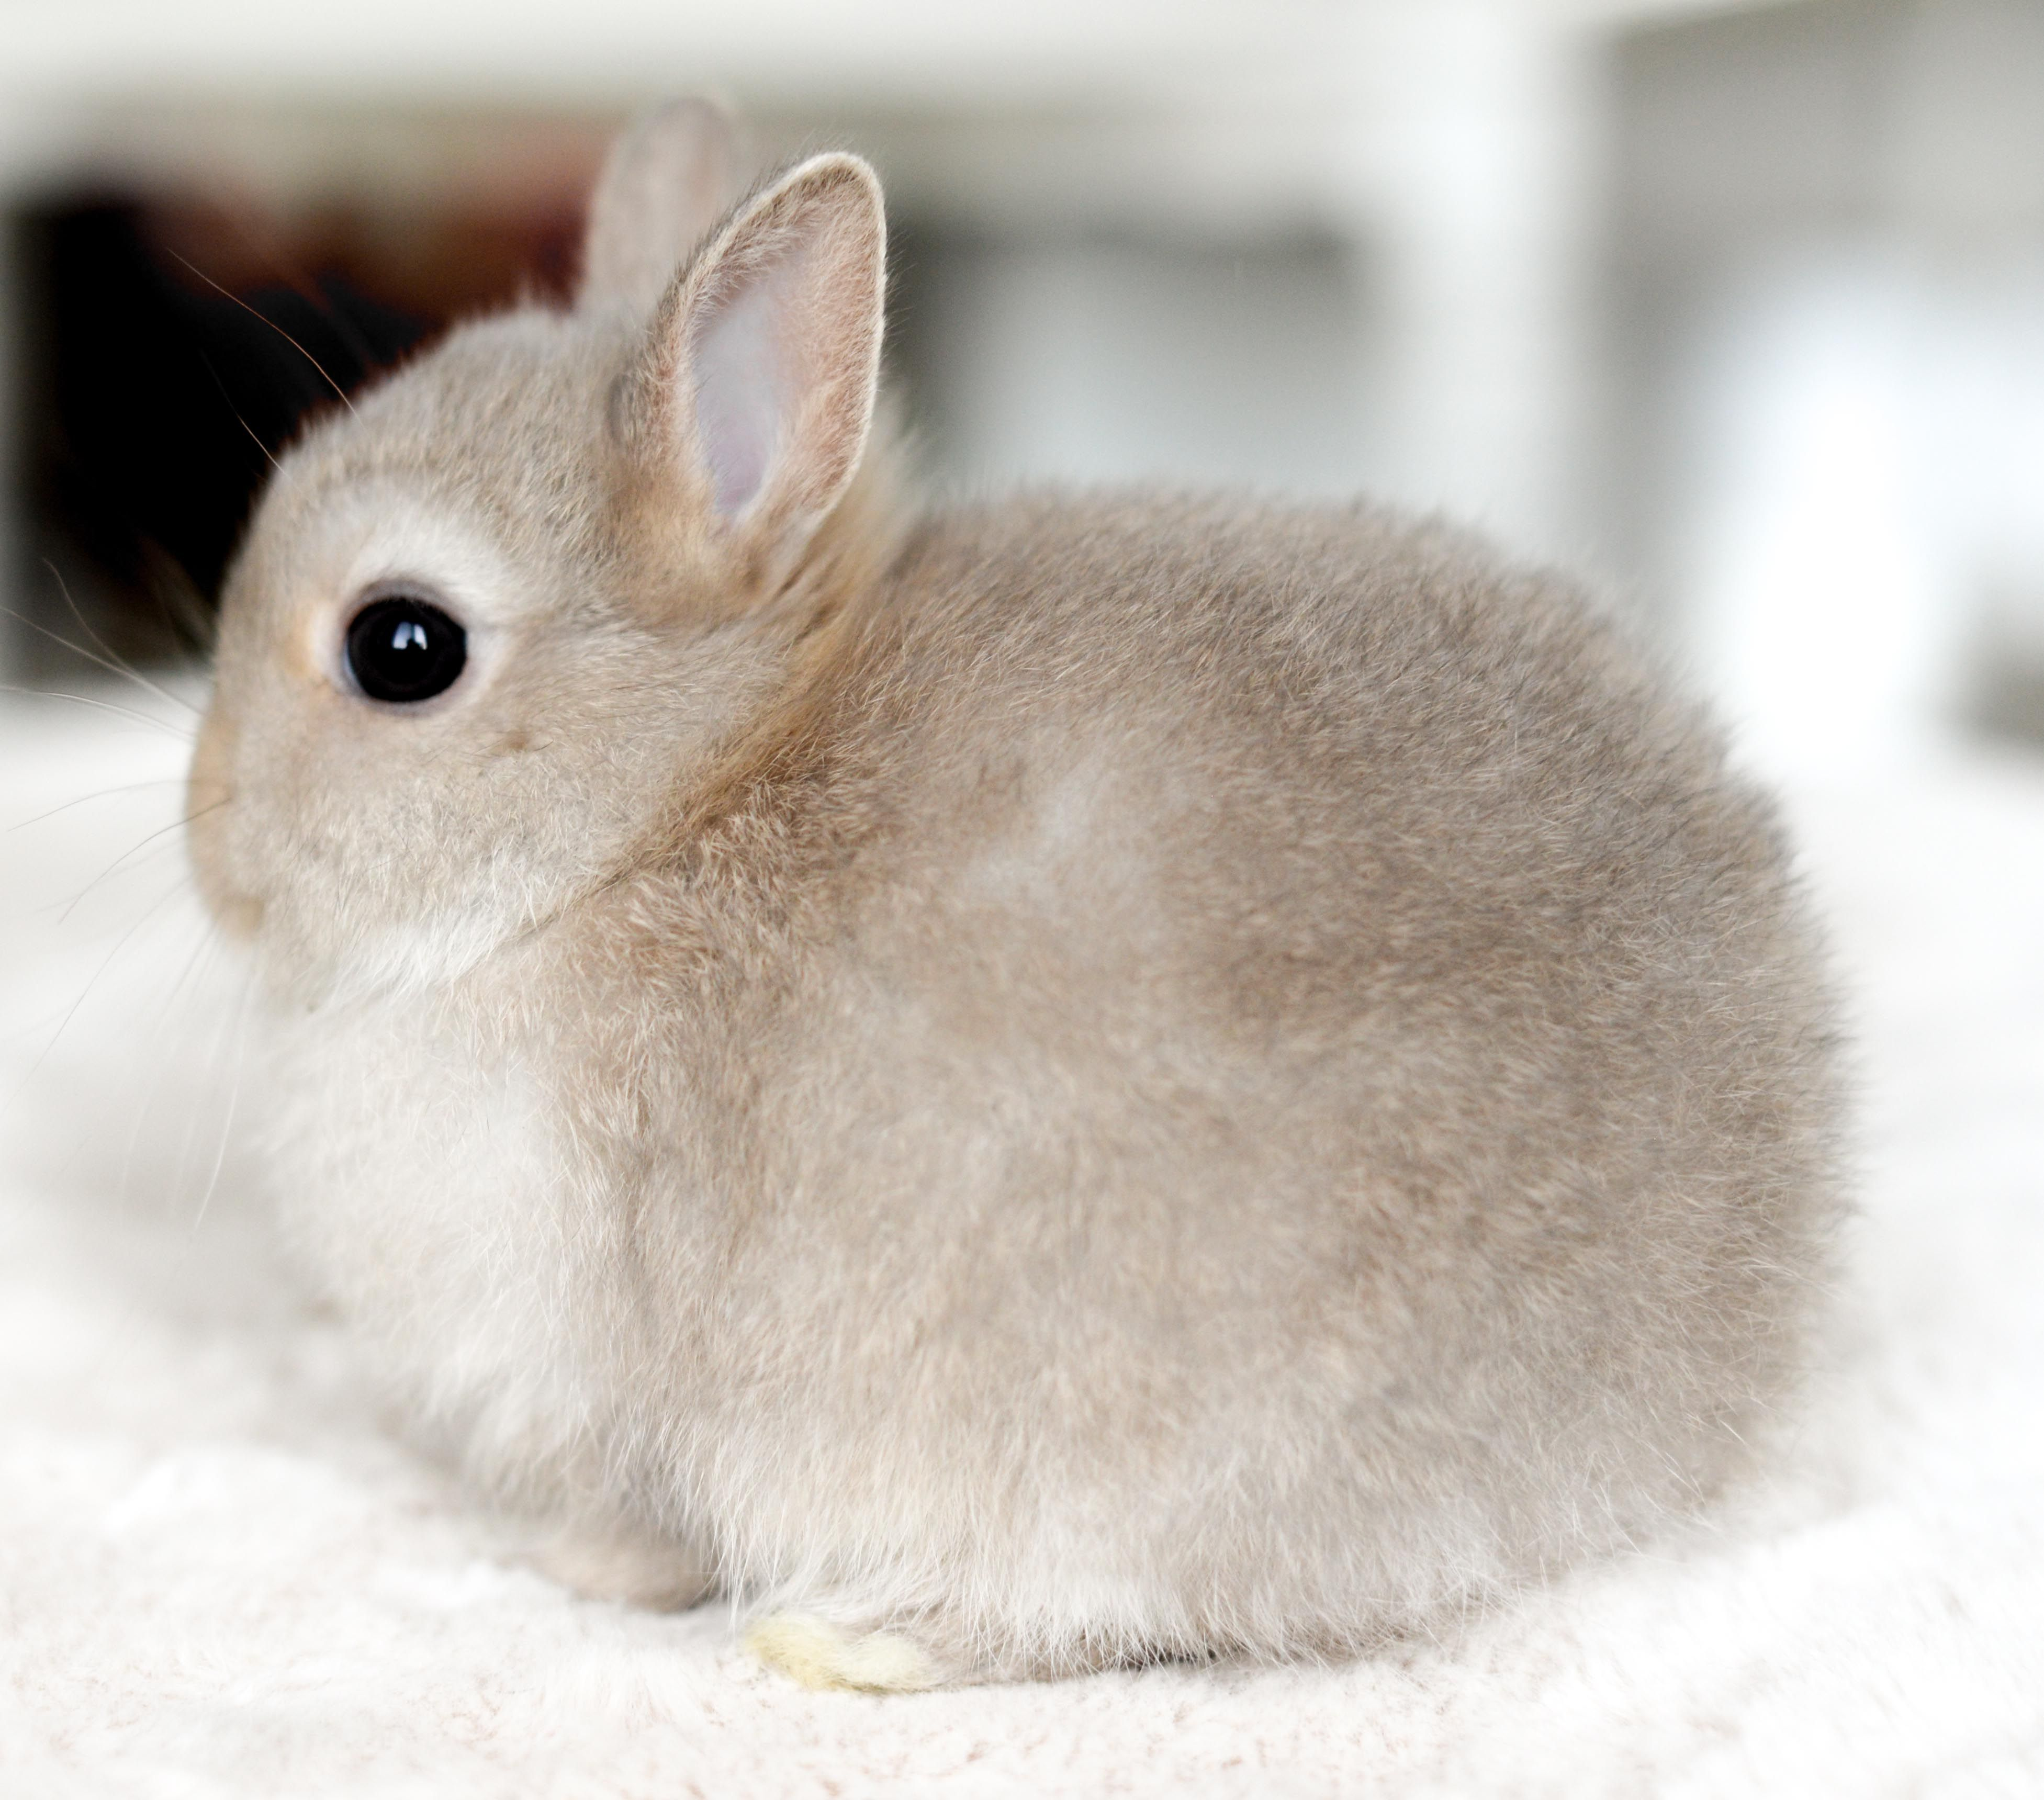 Pin By L U L U On Bunny Love Cute Baby Animals Cute Funny Animals Cute Little Animals